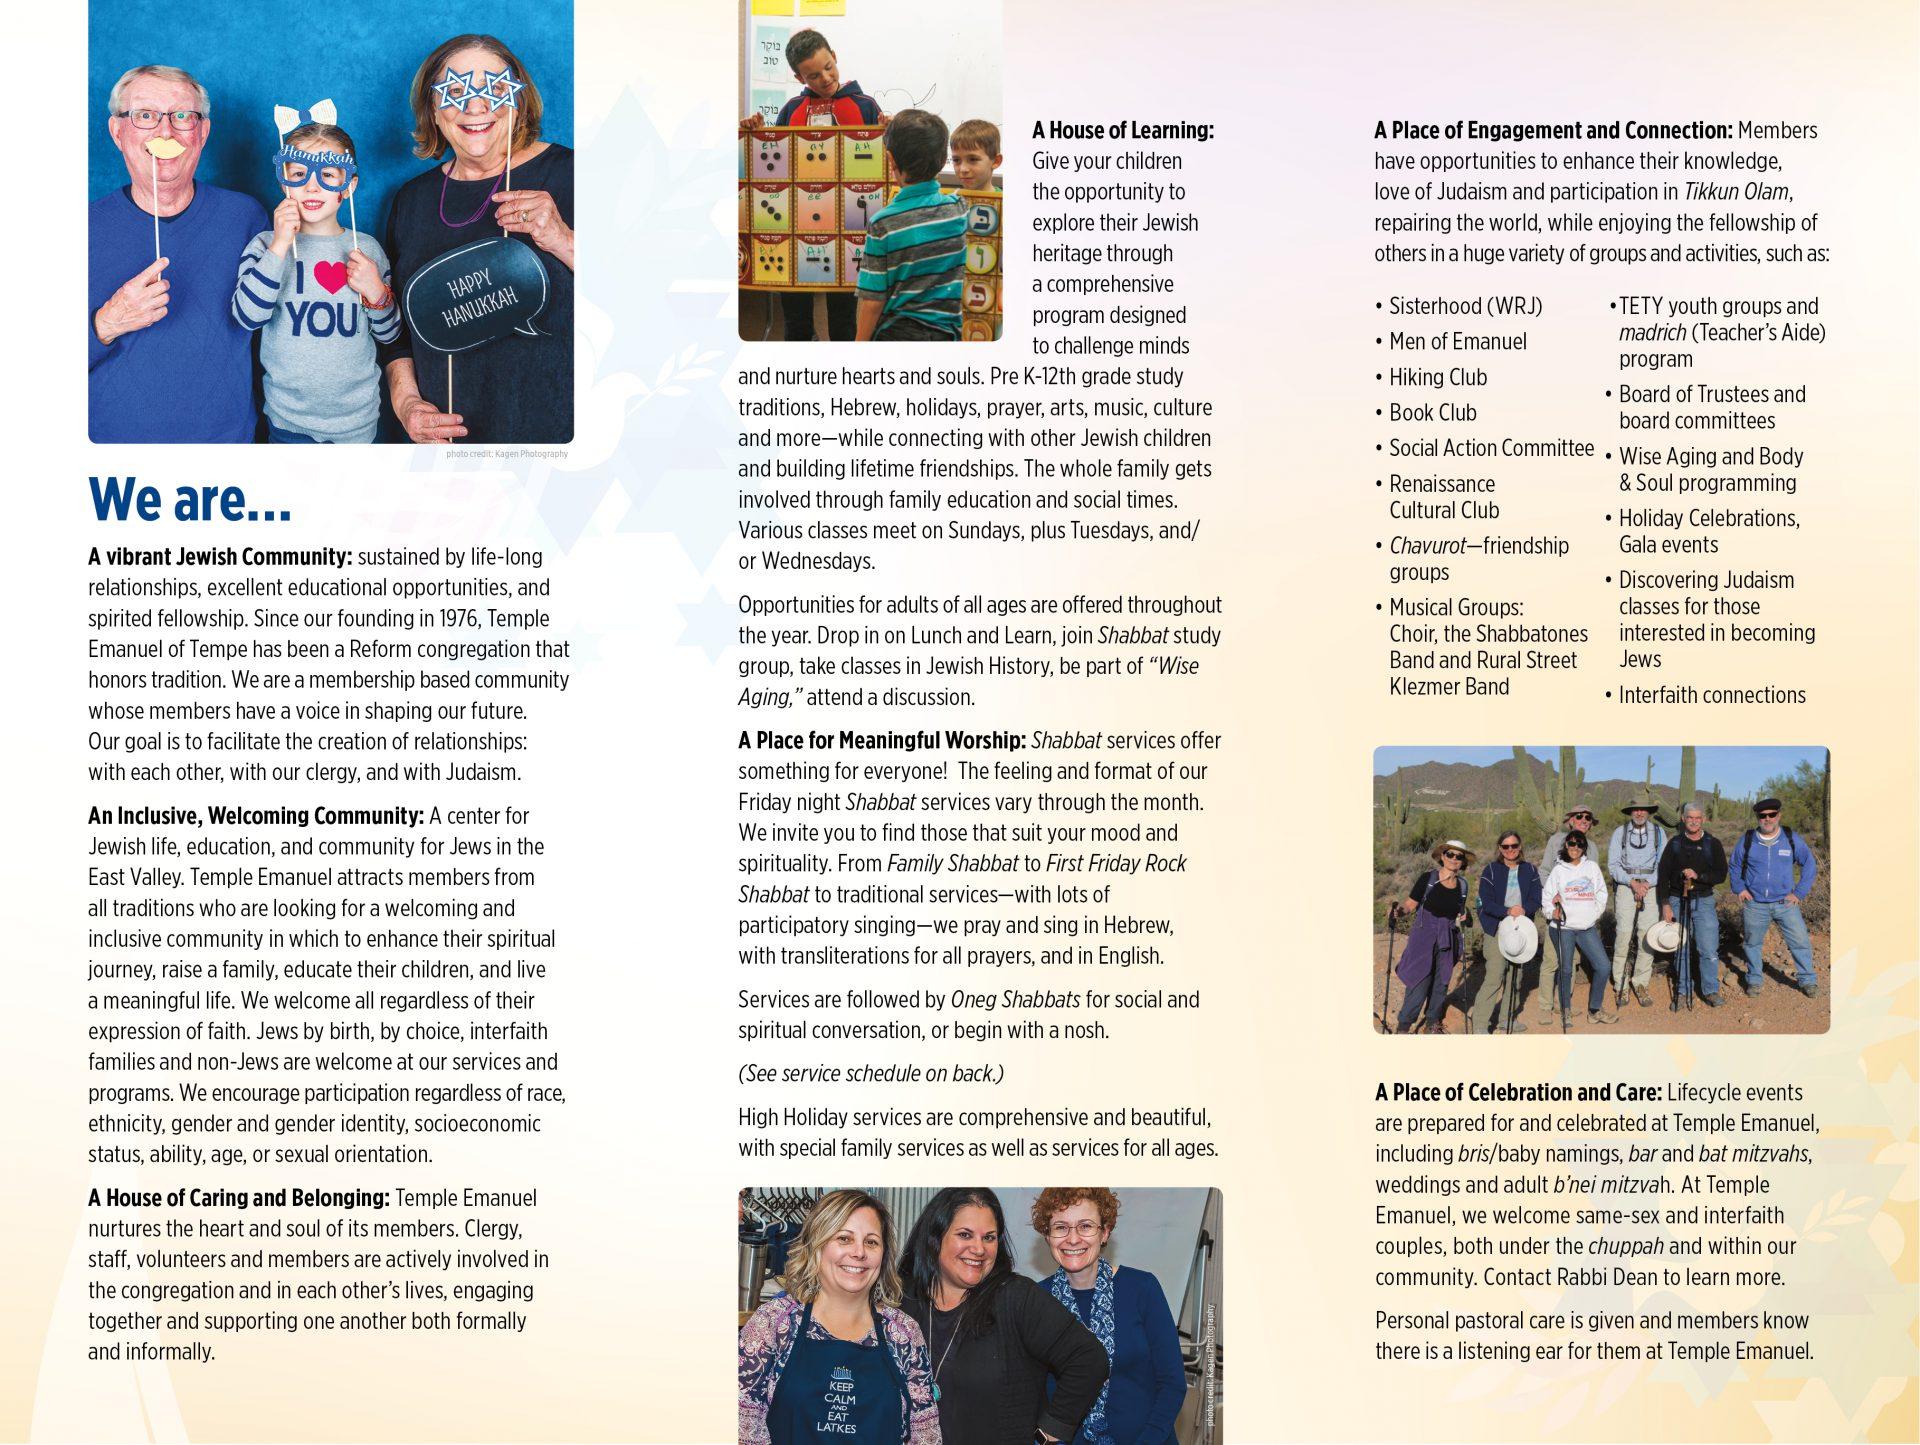 Temple-Emanuel-Community-brochure